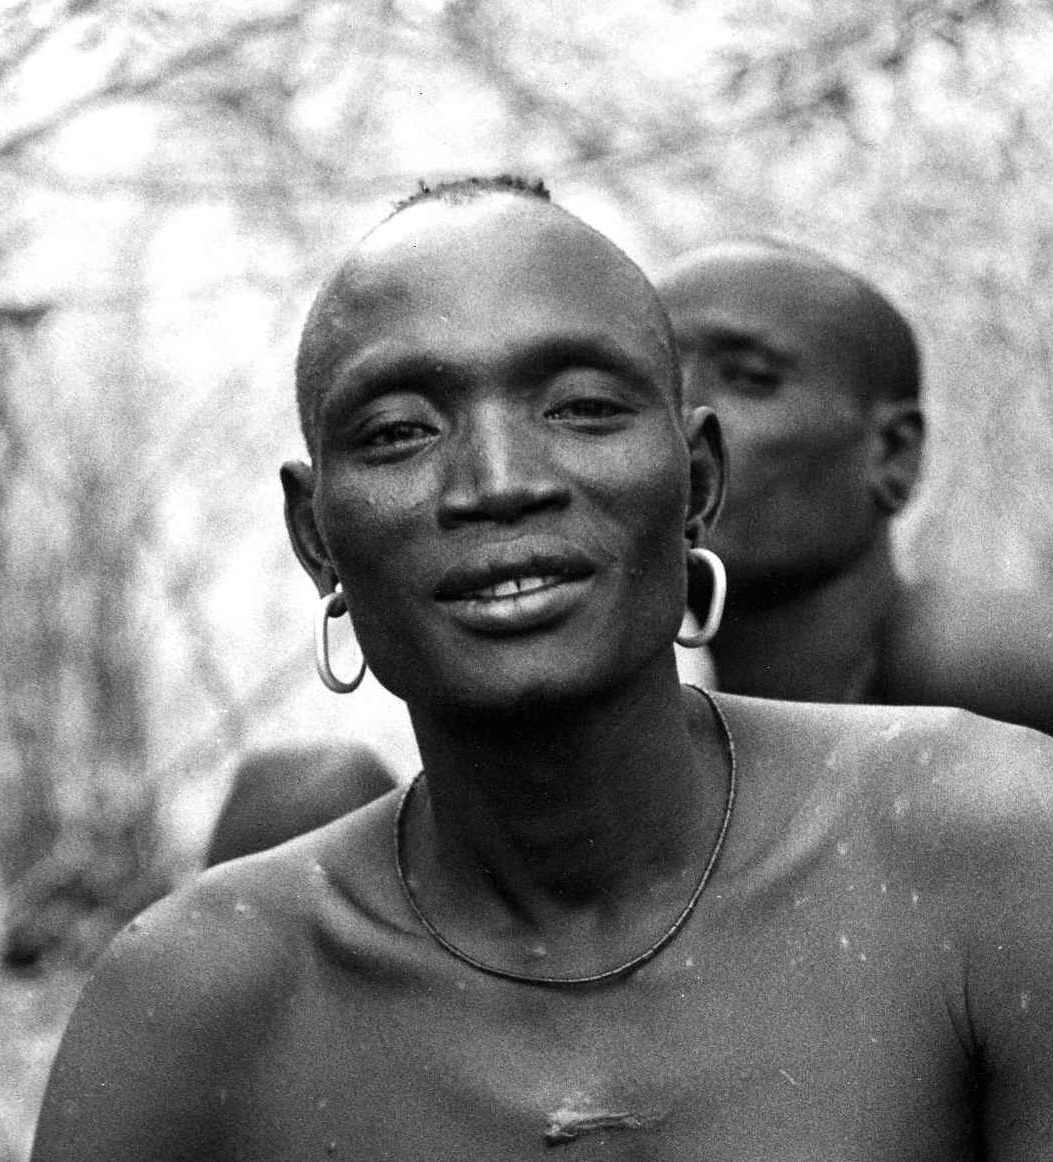 Ulikoro Konyonomora (Komor-a-kora) in 1969